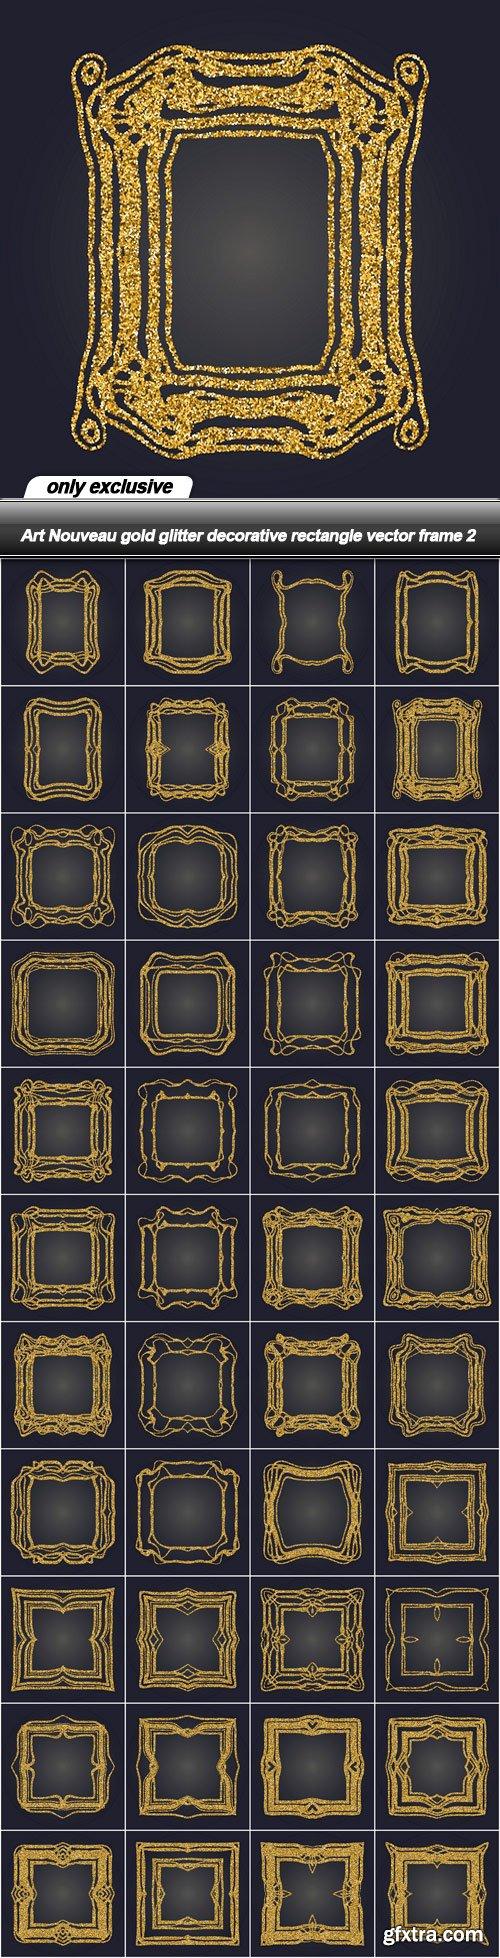 Art Nouveau gold glitter decorative rectangle vector frame 2 - 44 EPS